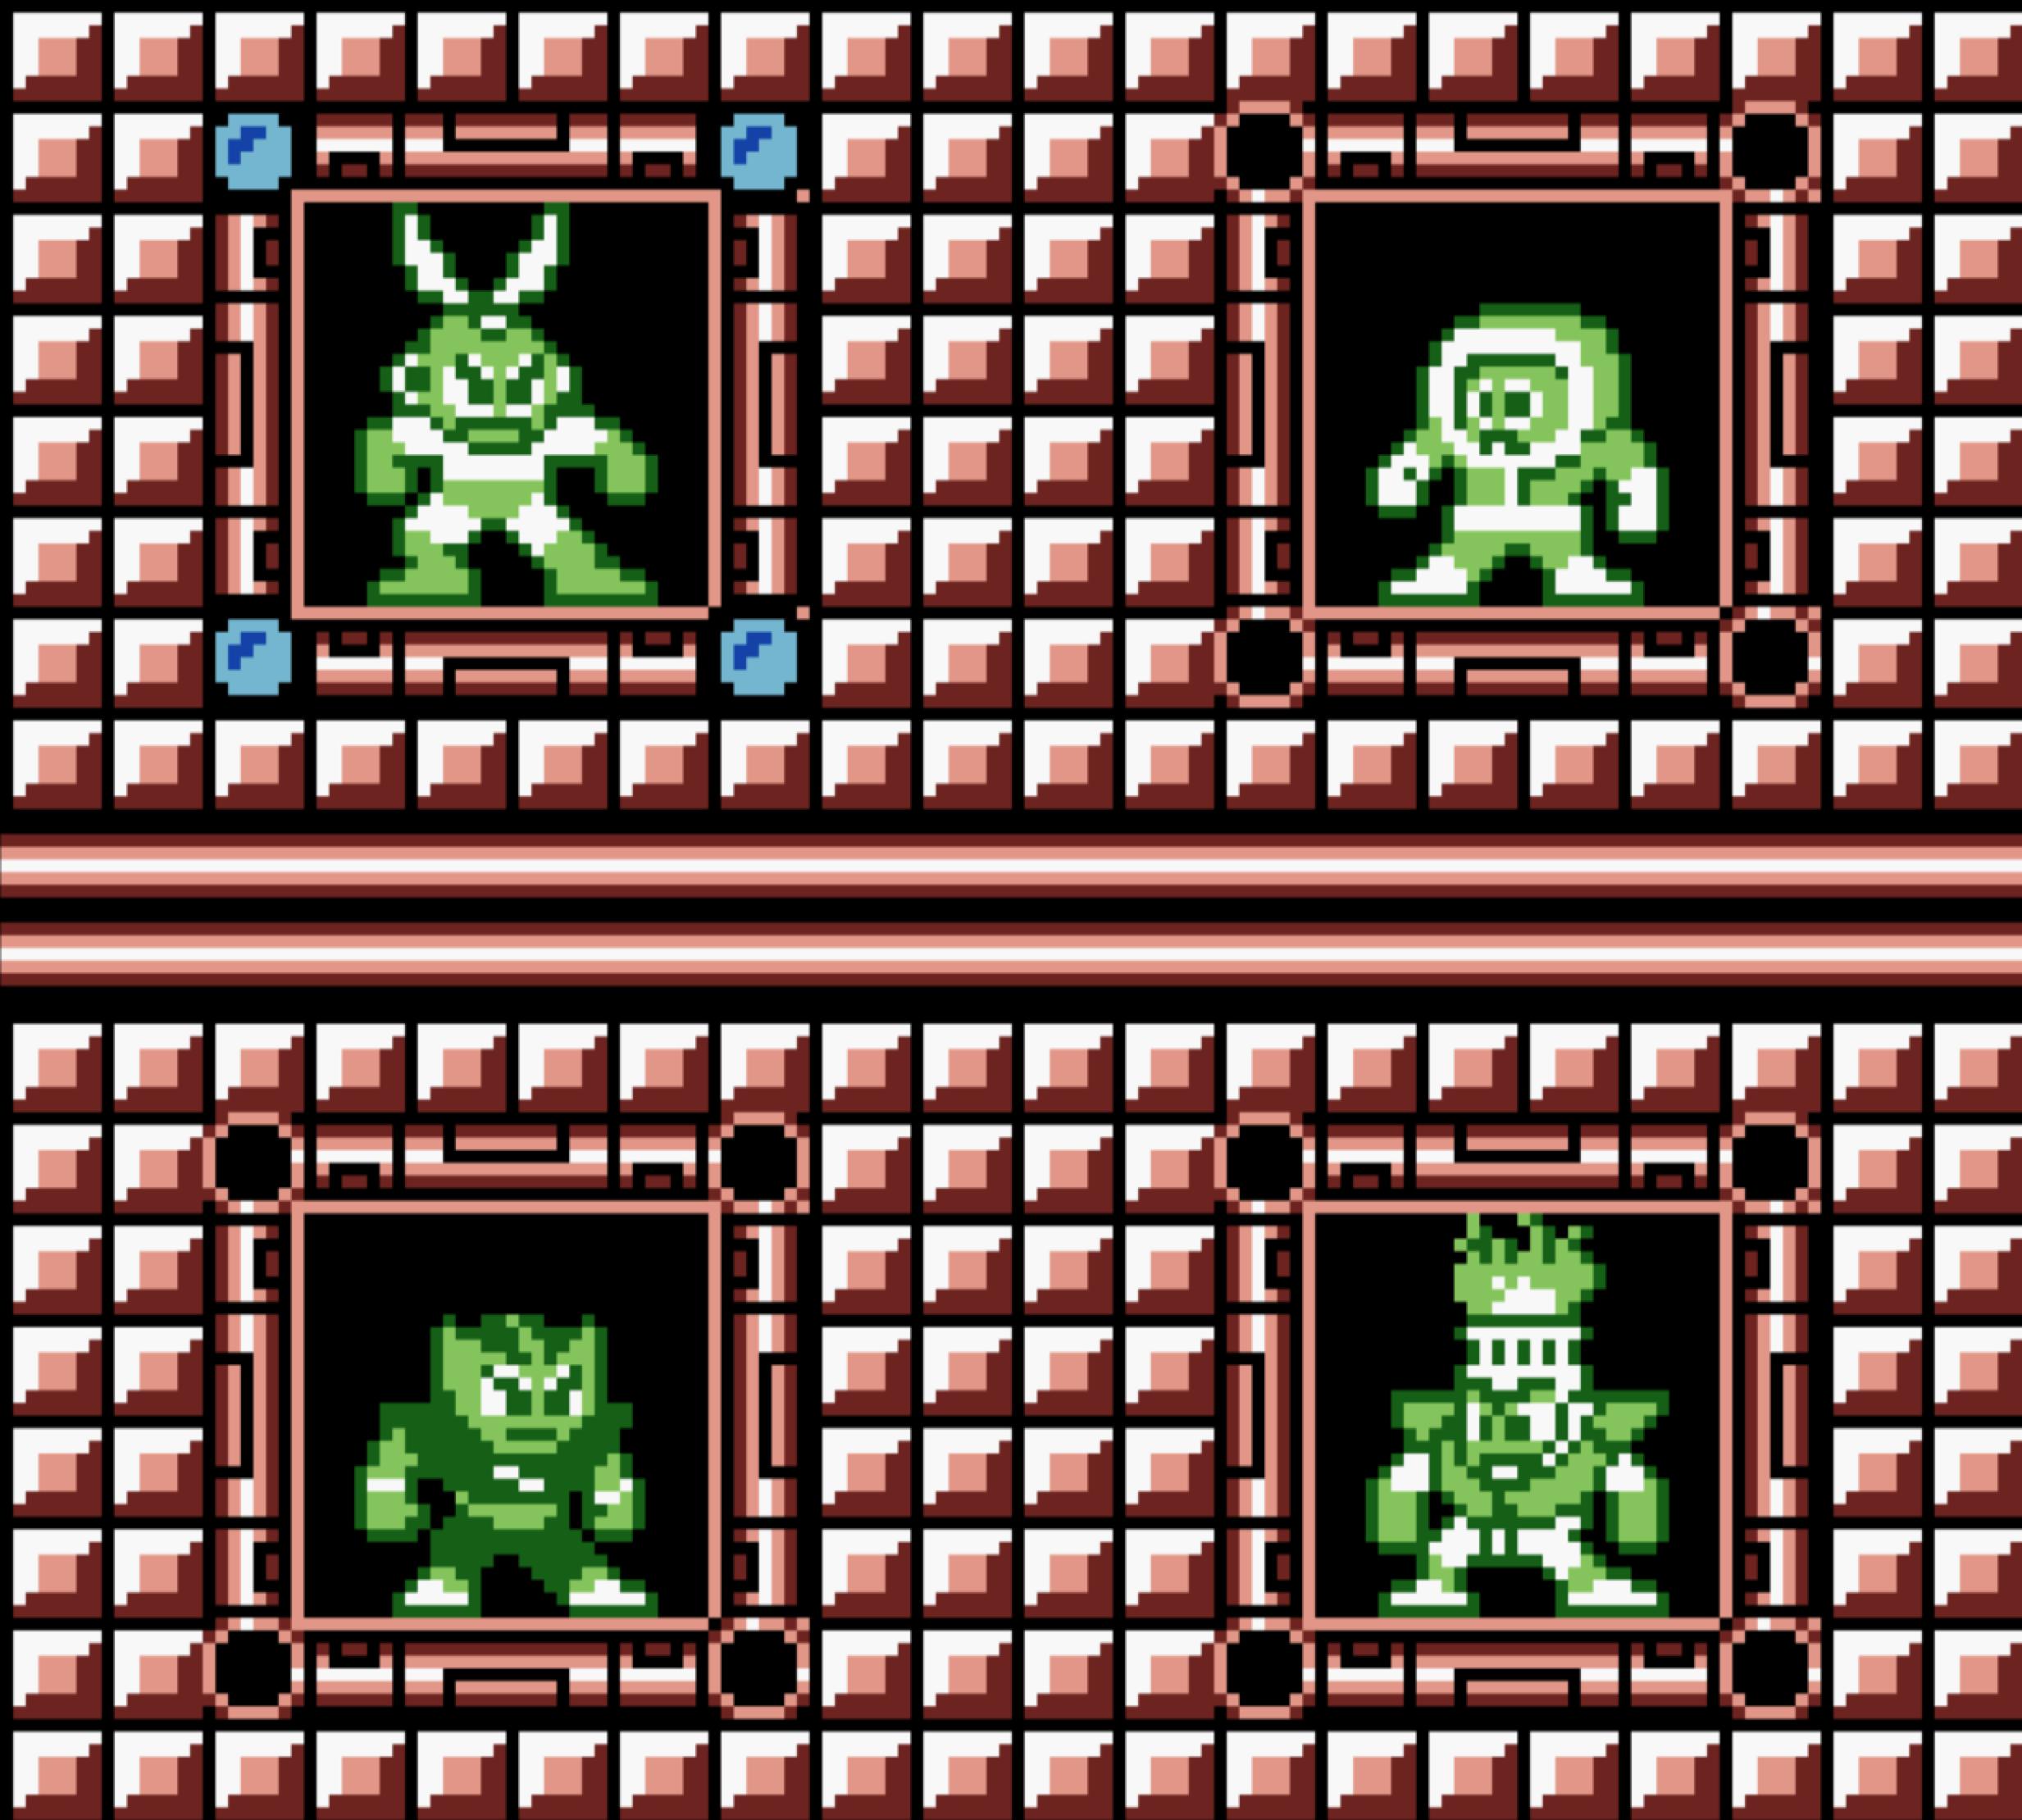 Mega Man Dr. Wily's Revenge 2018-09-22 17.09.55.png